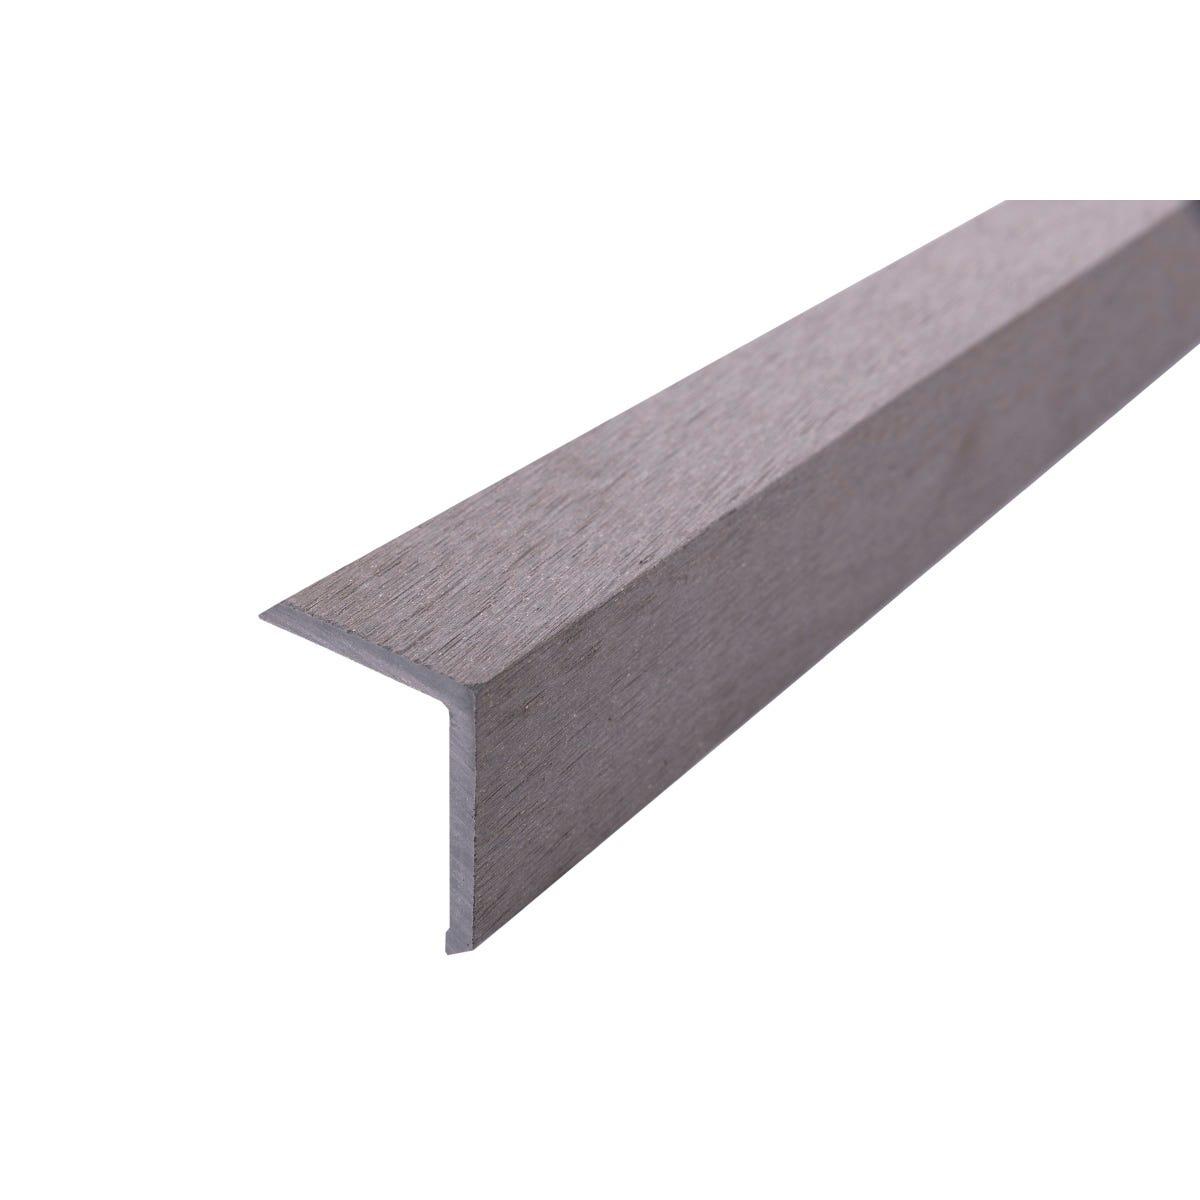 Select Composite Decking 1.8m Corner Trim Pk 5 - Light Grey